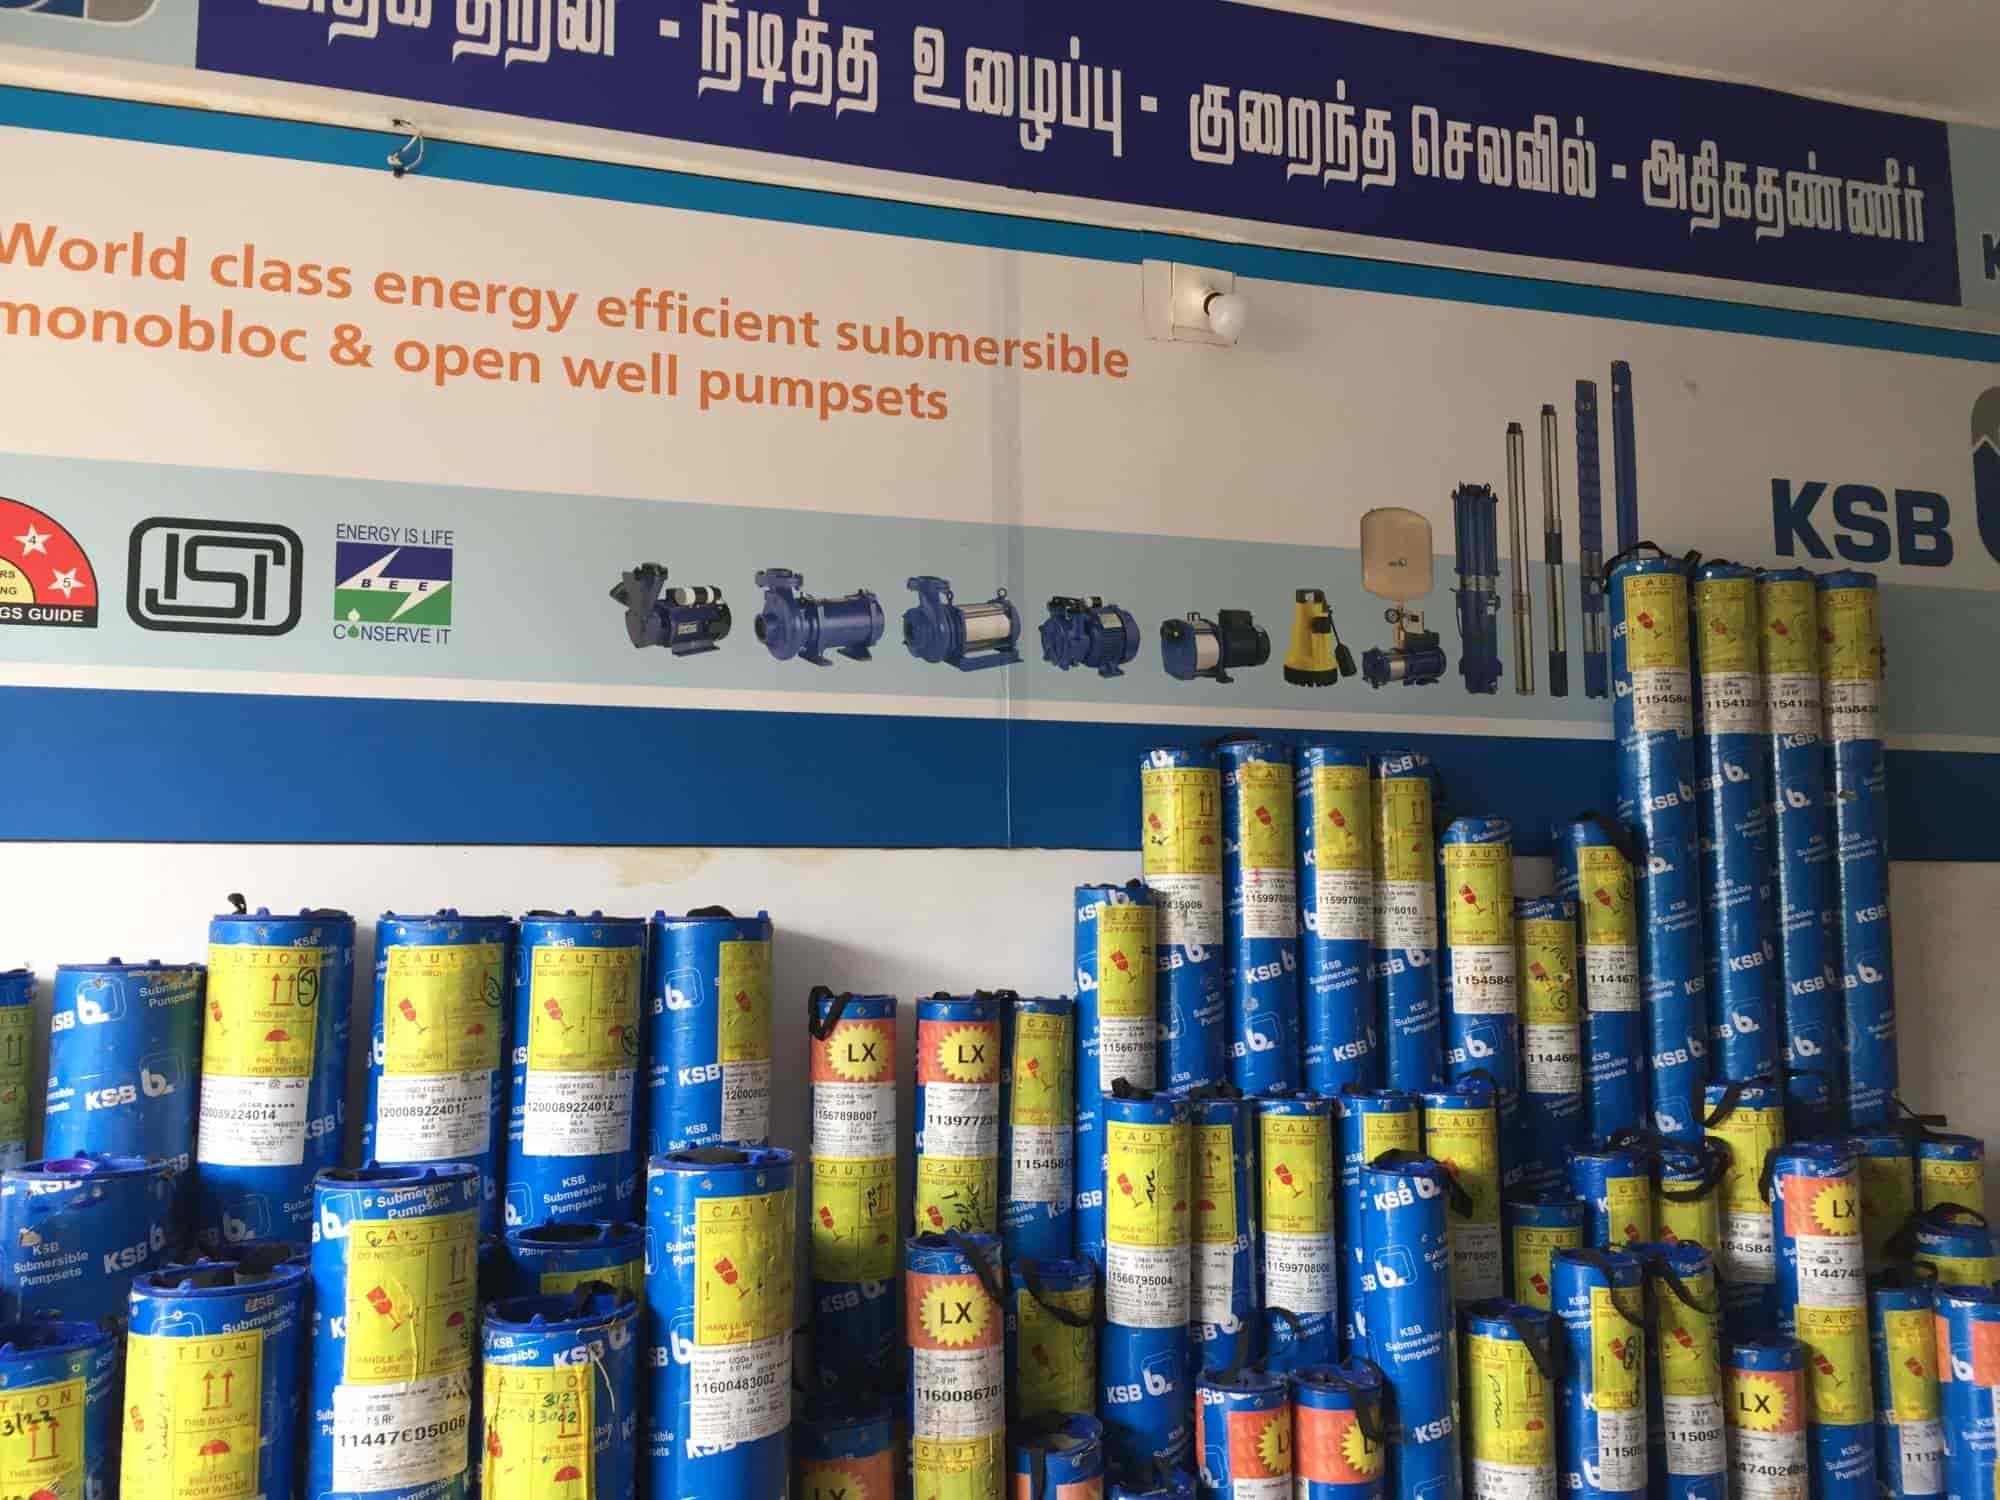 Vijay Tradings-KSB, Opp  Hotel Regency - Submersible Pump